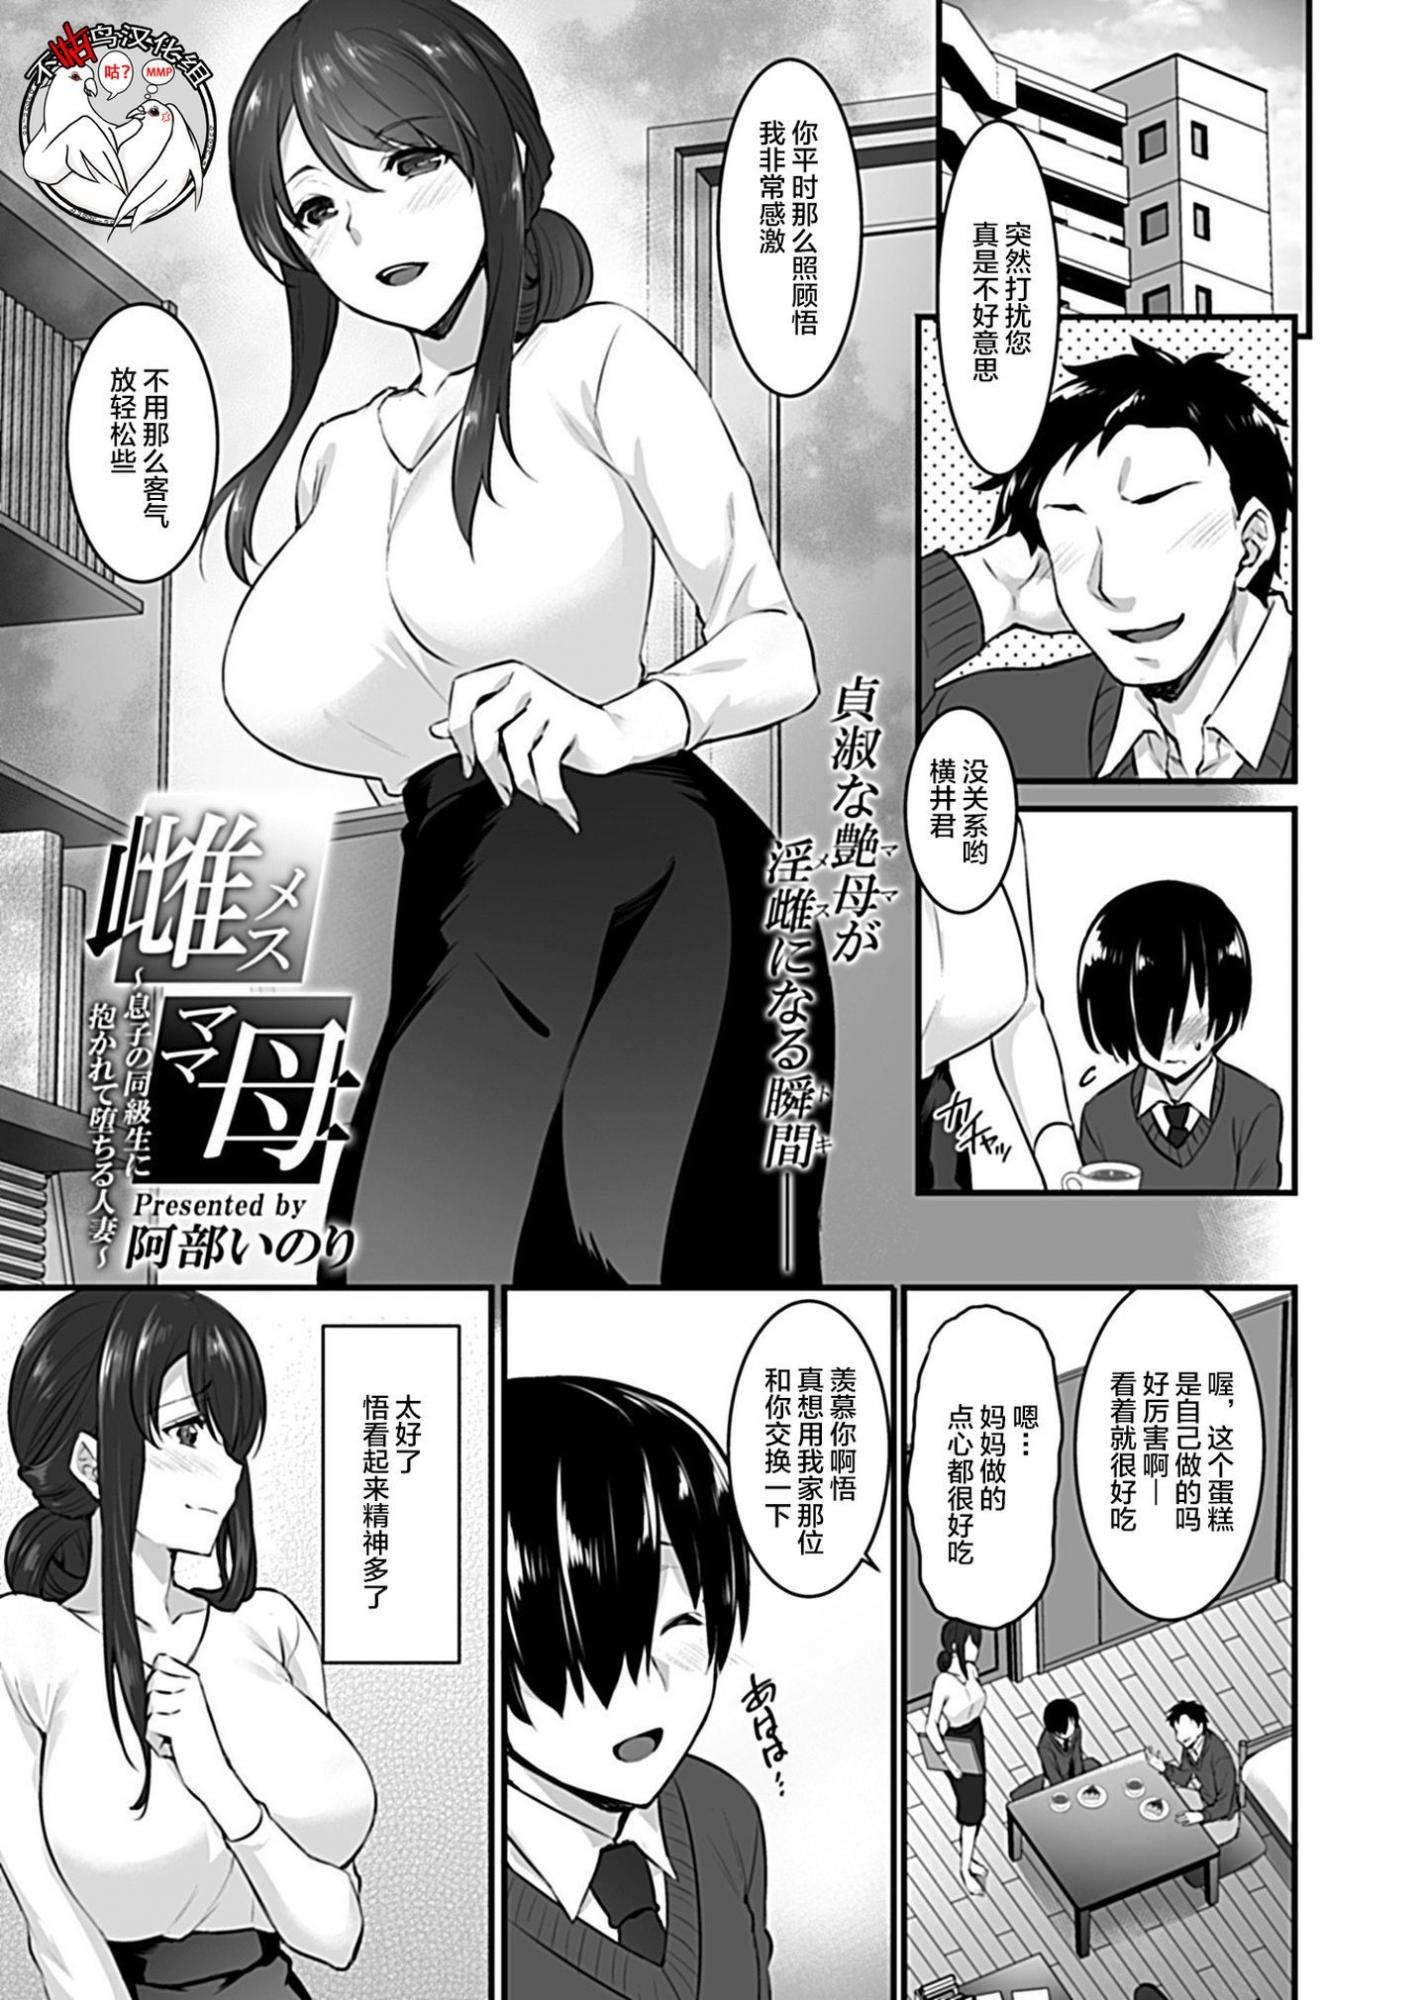 [不咕鳥漢化組] [阿部いのり] 雌母 (COMIC GEE Vol.2)(18P) - 情色卡漫 -